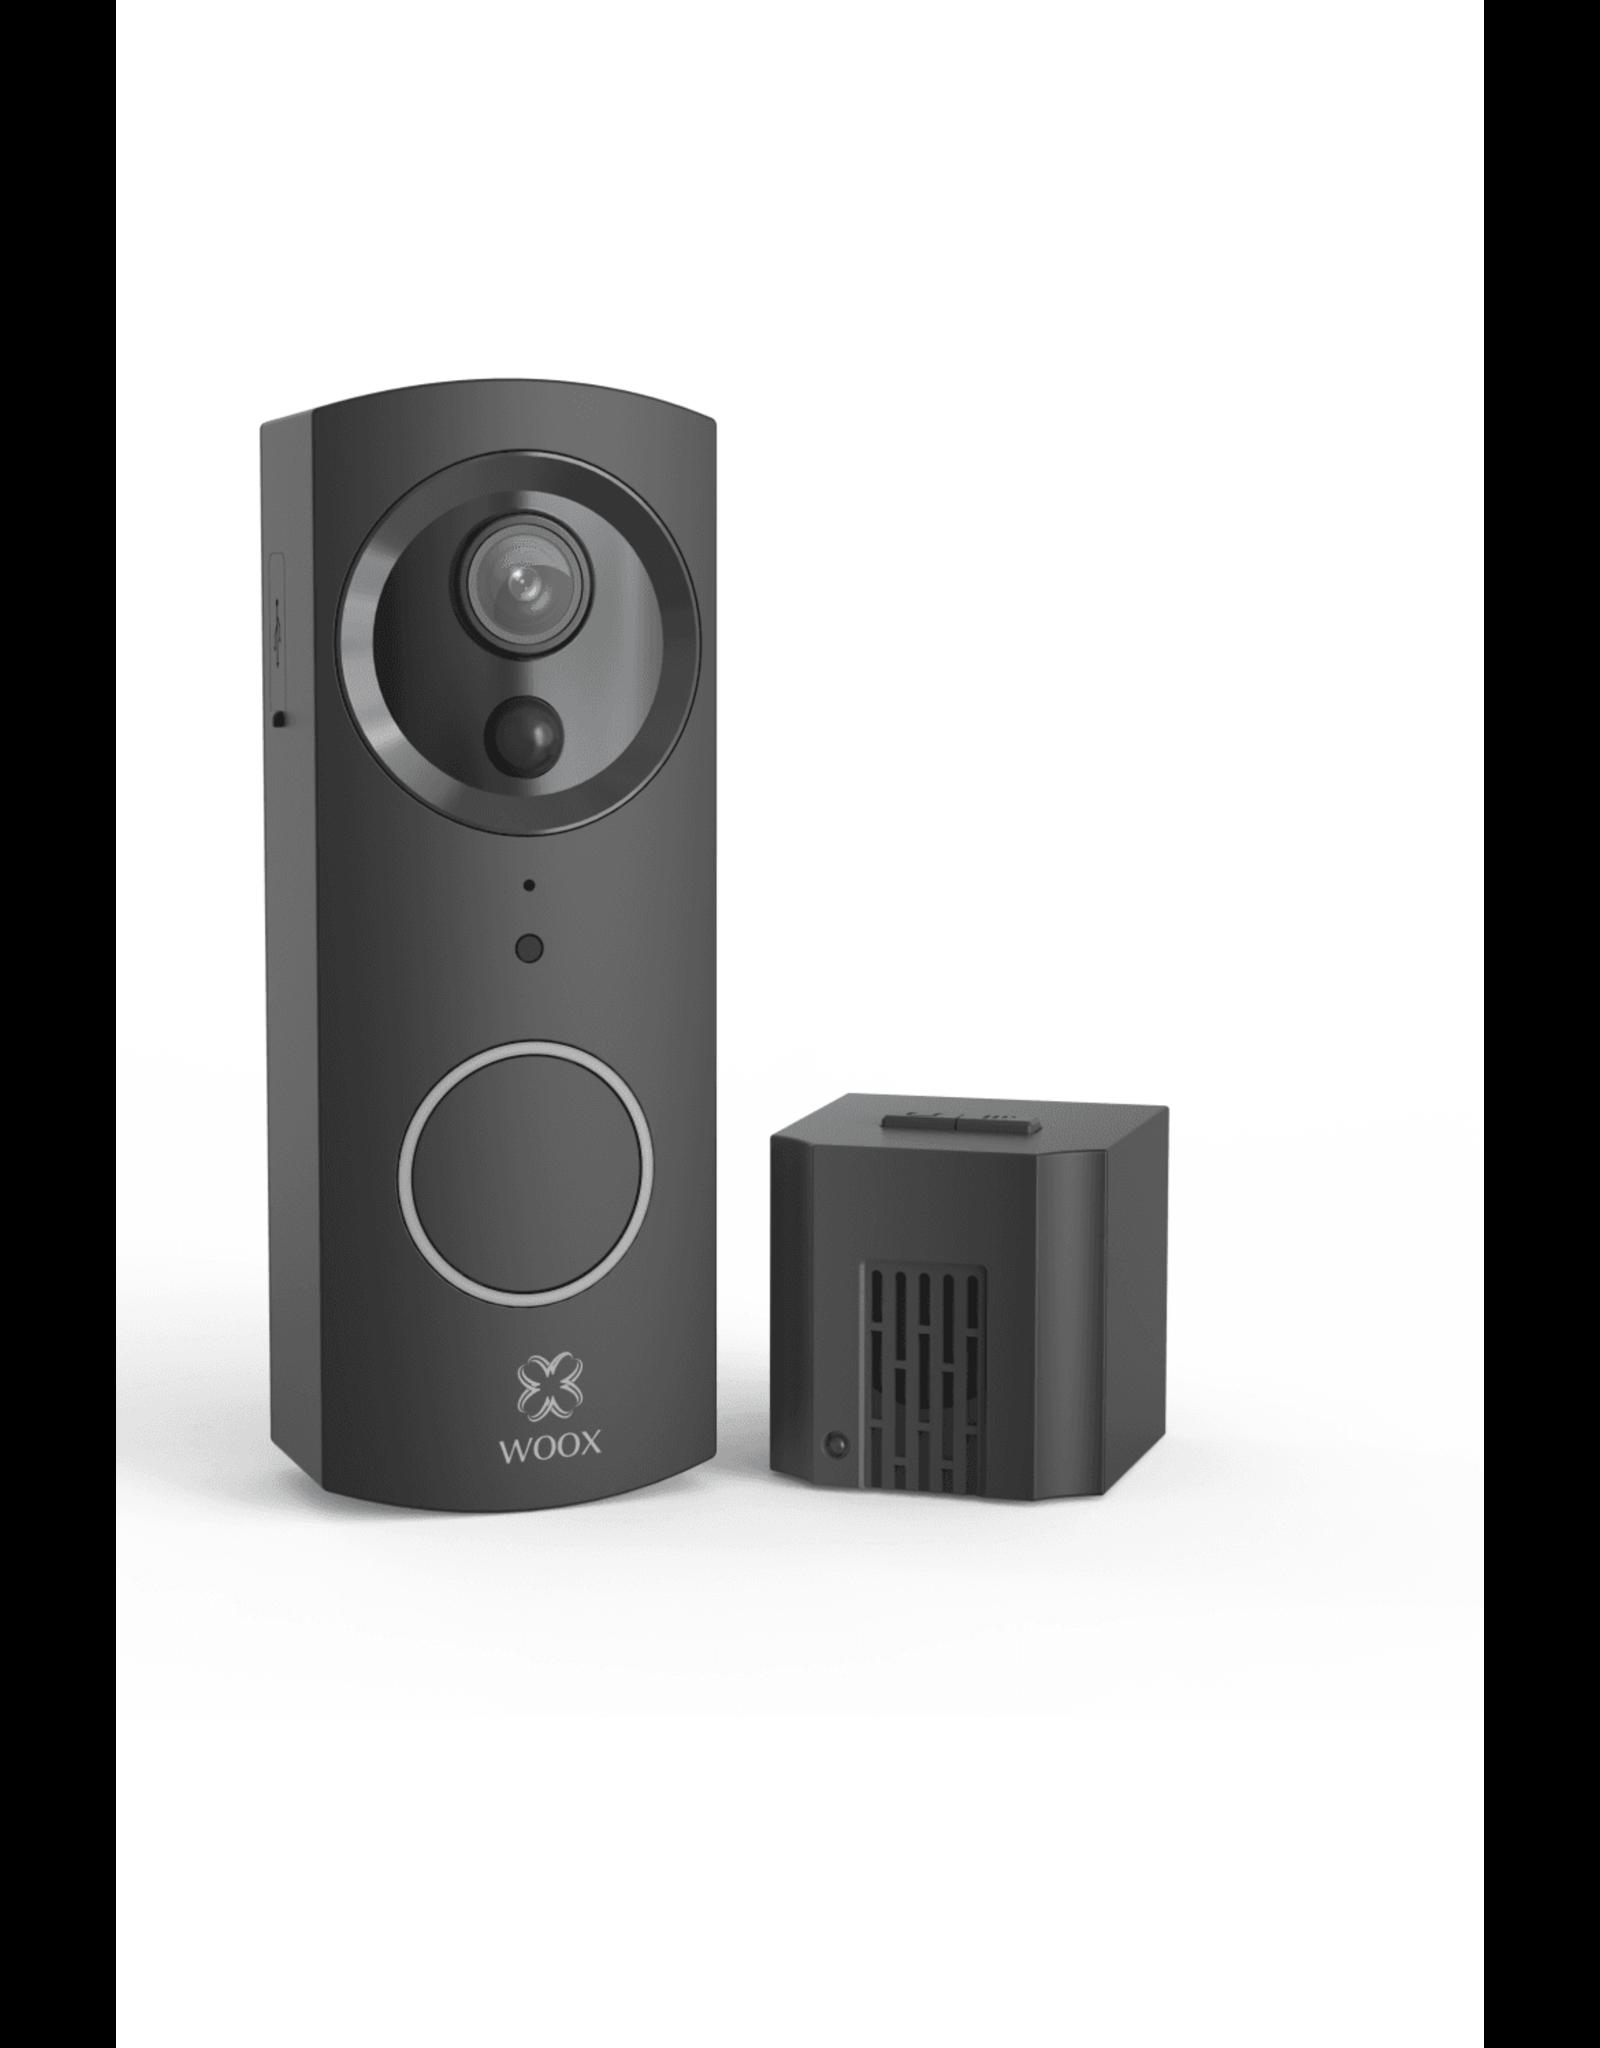 Woox Home Smart WiFi Video Doorbell & Chime   R9061